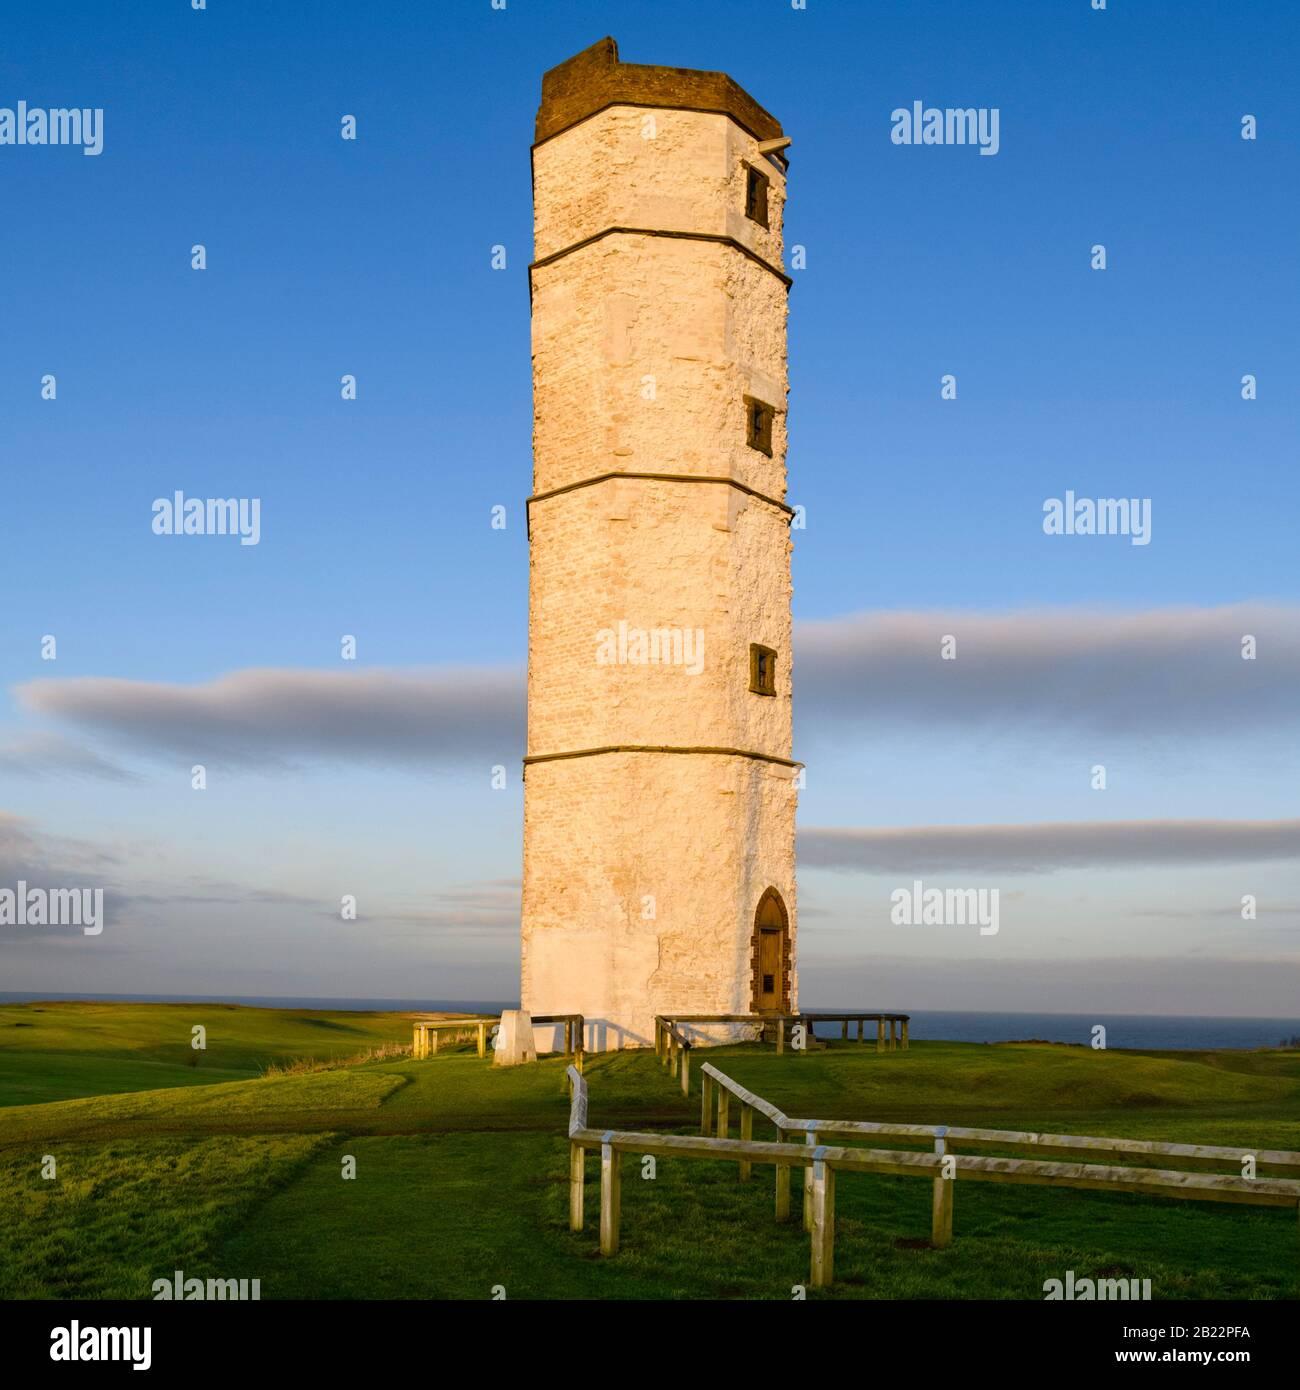 Exterior of old sunlit Flamborough Head Lighthouse (historic tall white chalk octagonal beacon tower) & deep blue sky - near Bridlington, England, UK. Stock Photo